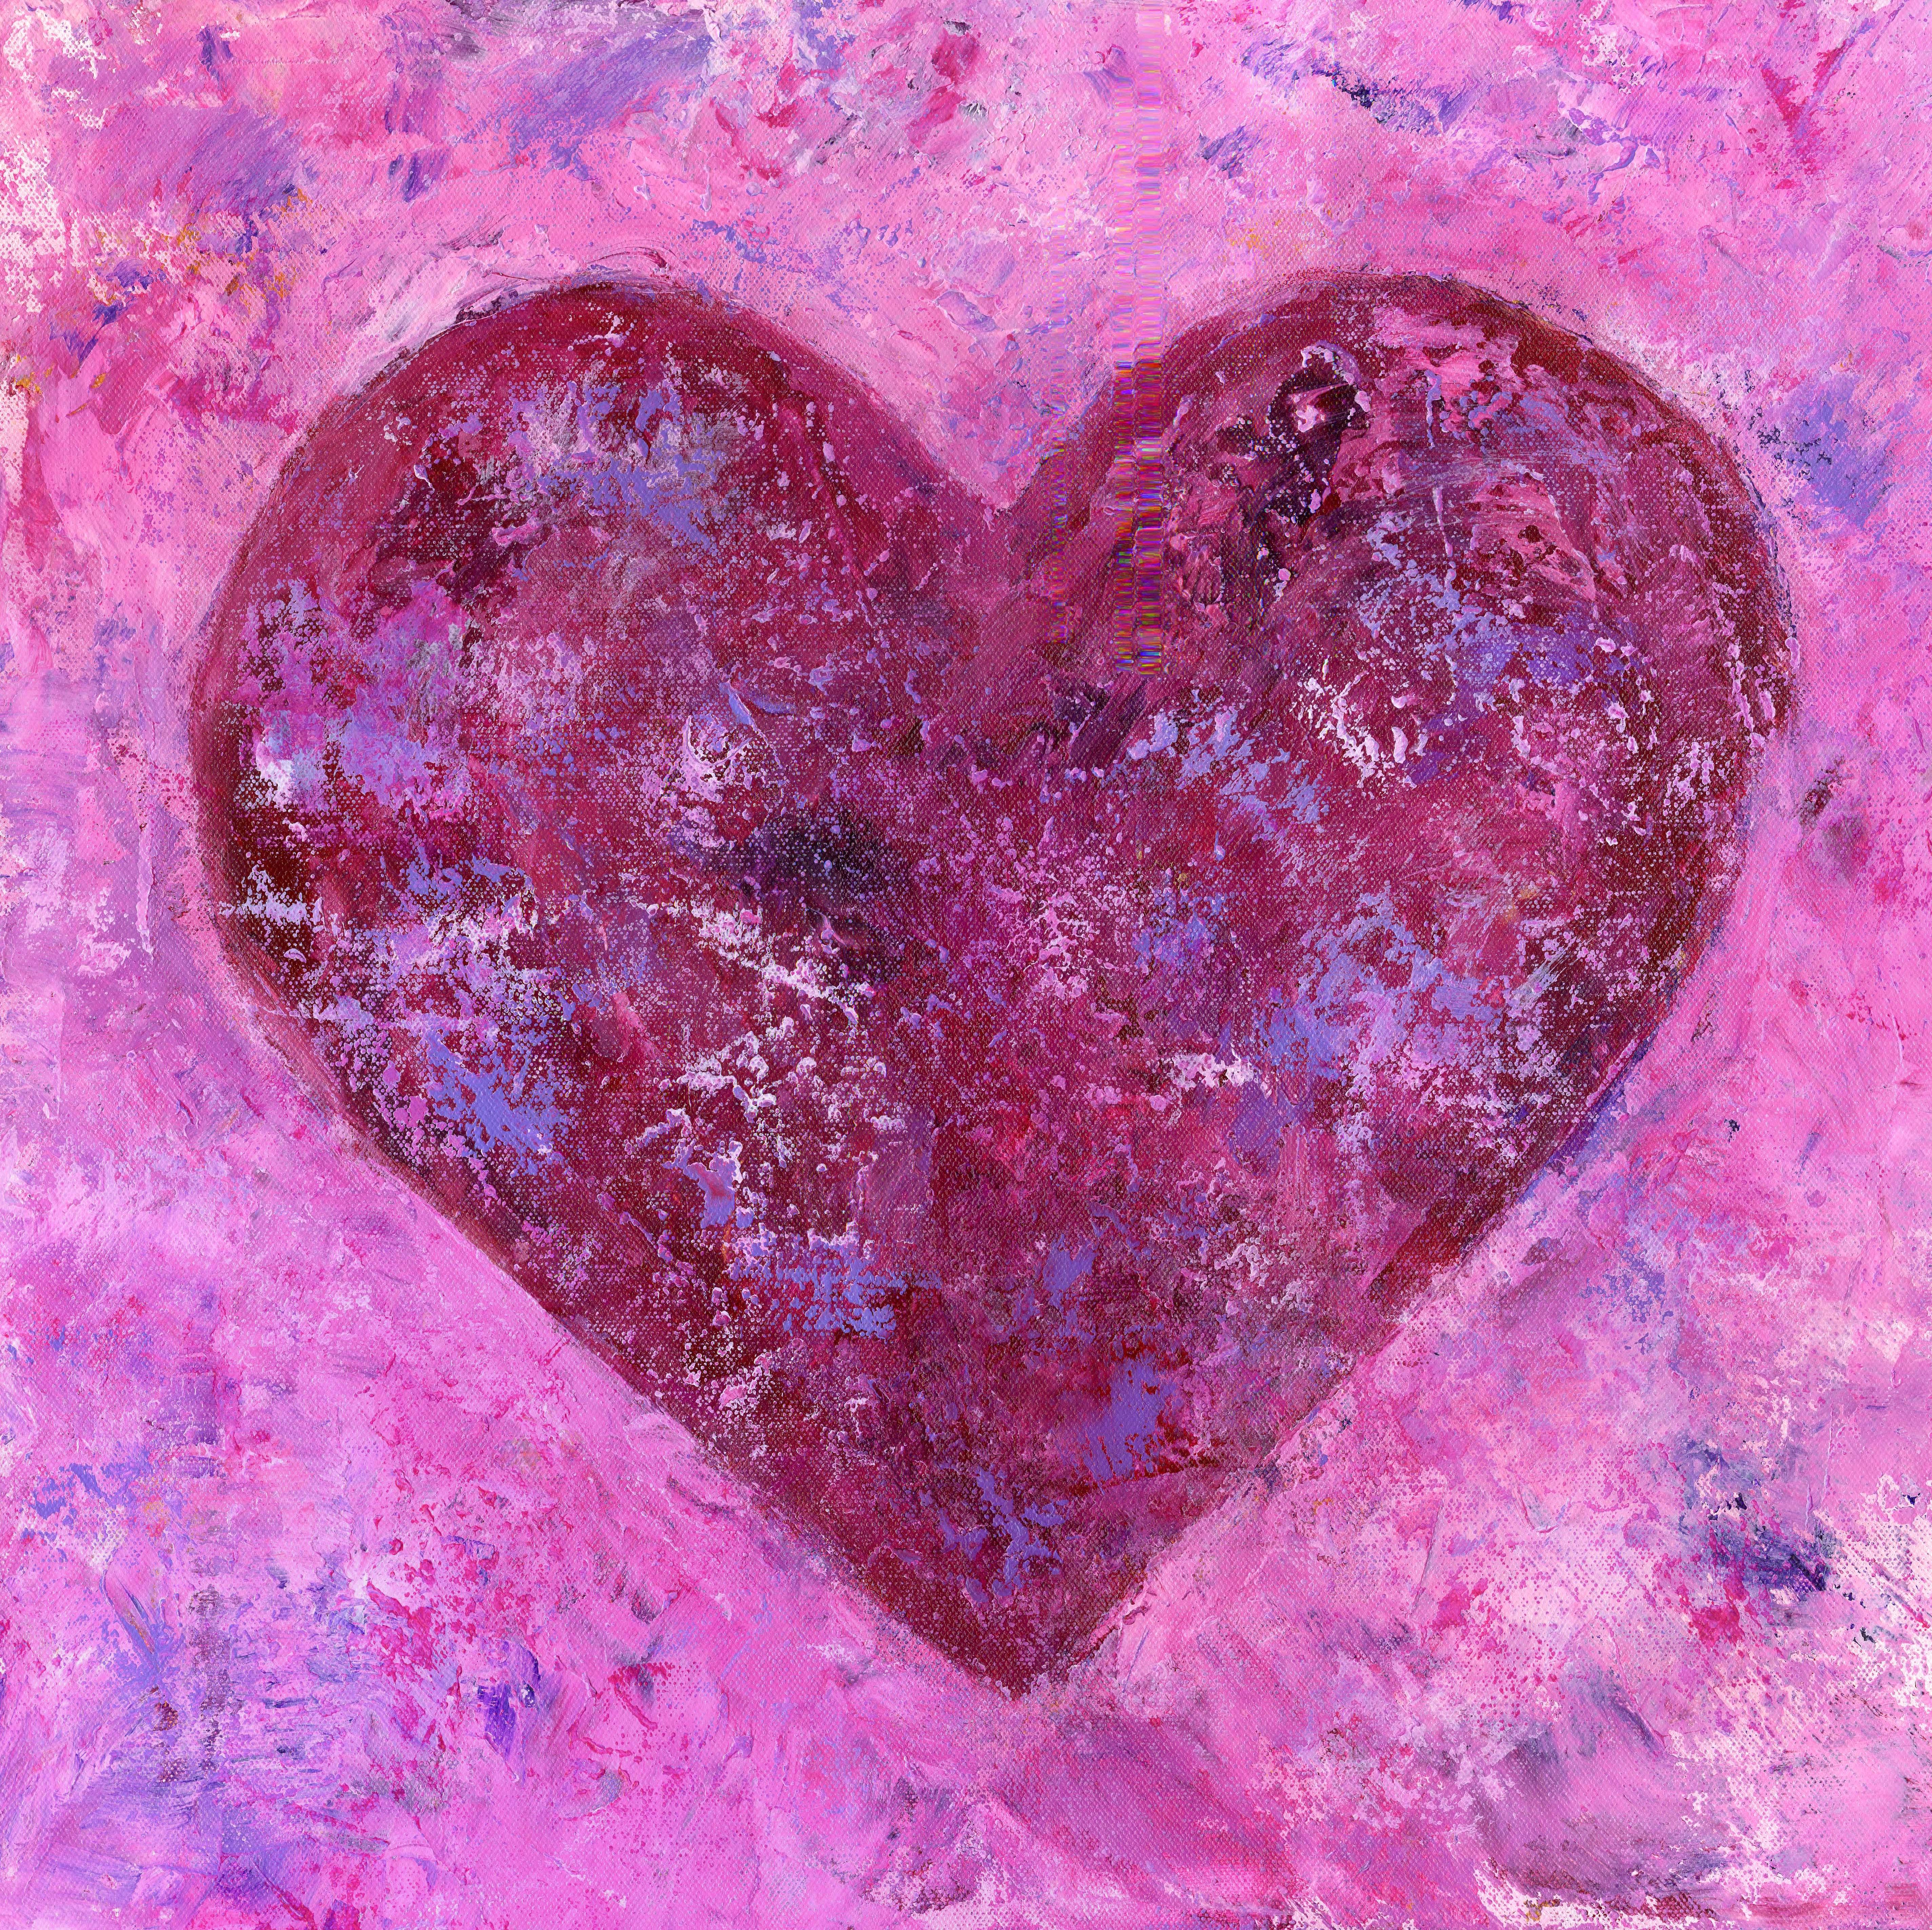 Warm Heart - Acrylic 20 X 20 - $300